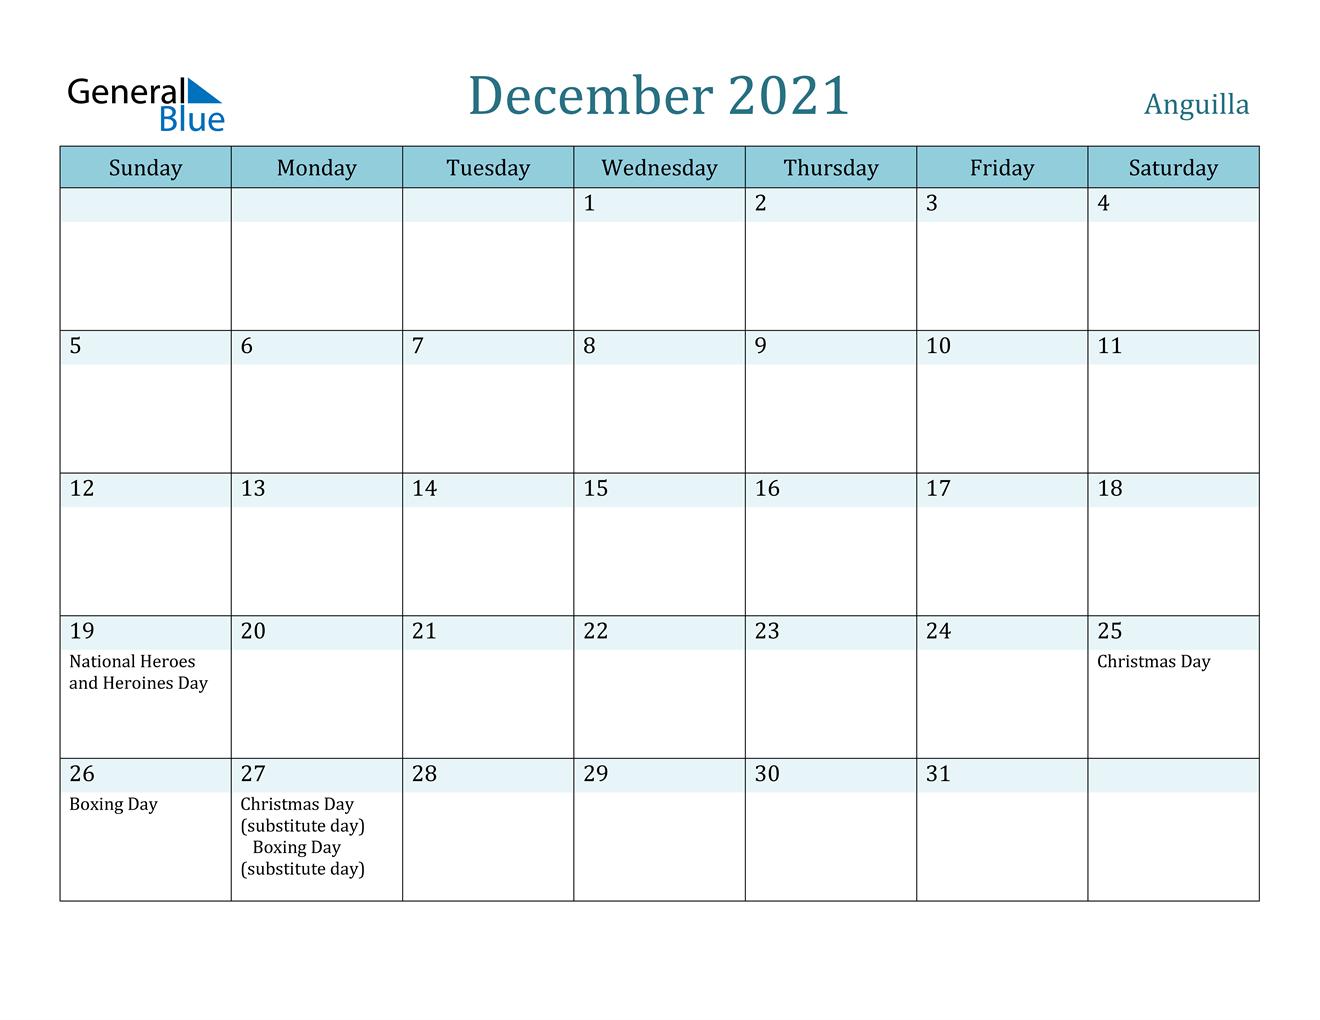 December 2021 Calendar - Anguilla